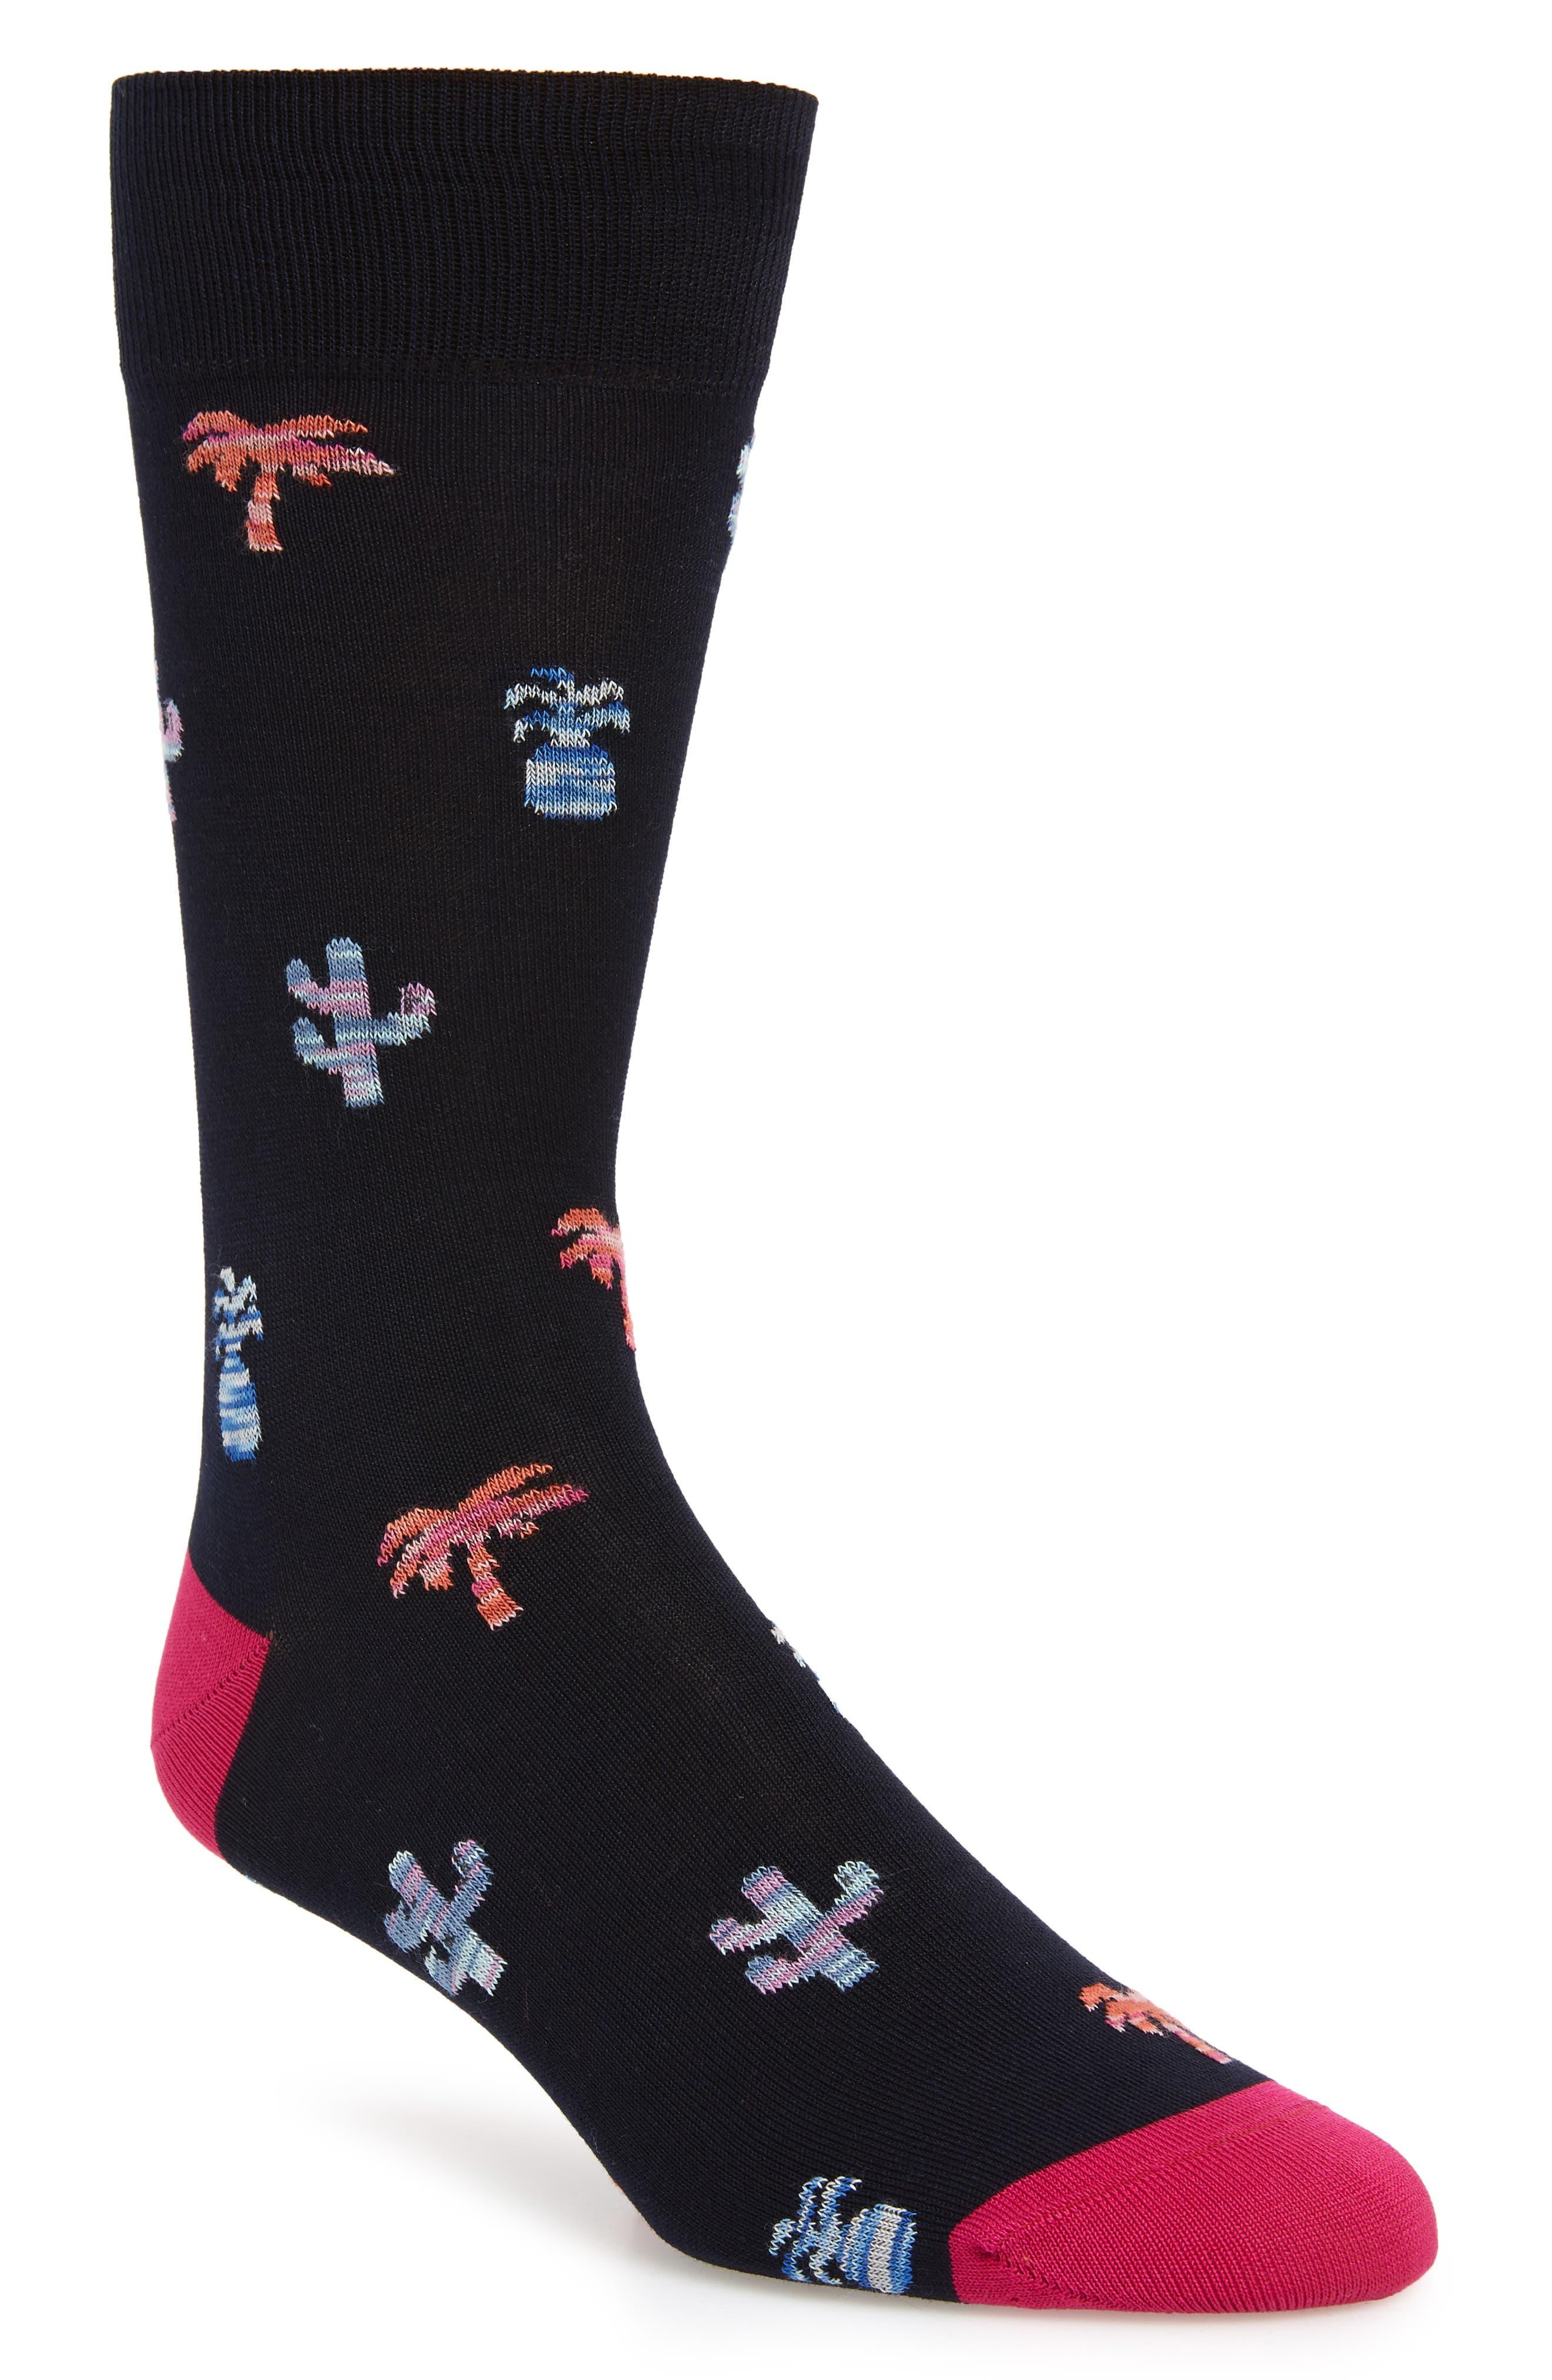 Patterned Mercerized Cotton Blend Socks, Main, color, MIDNIGHT